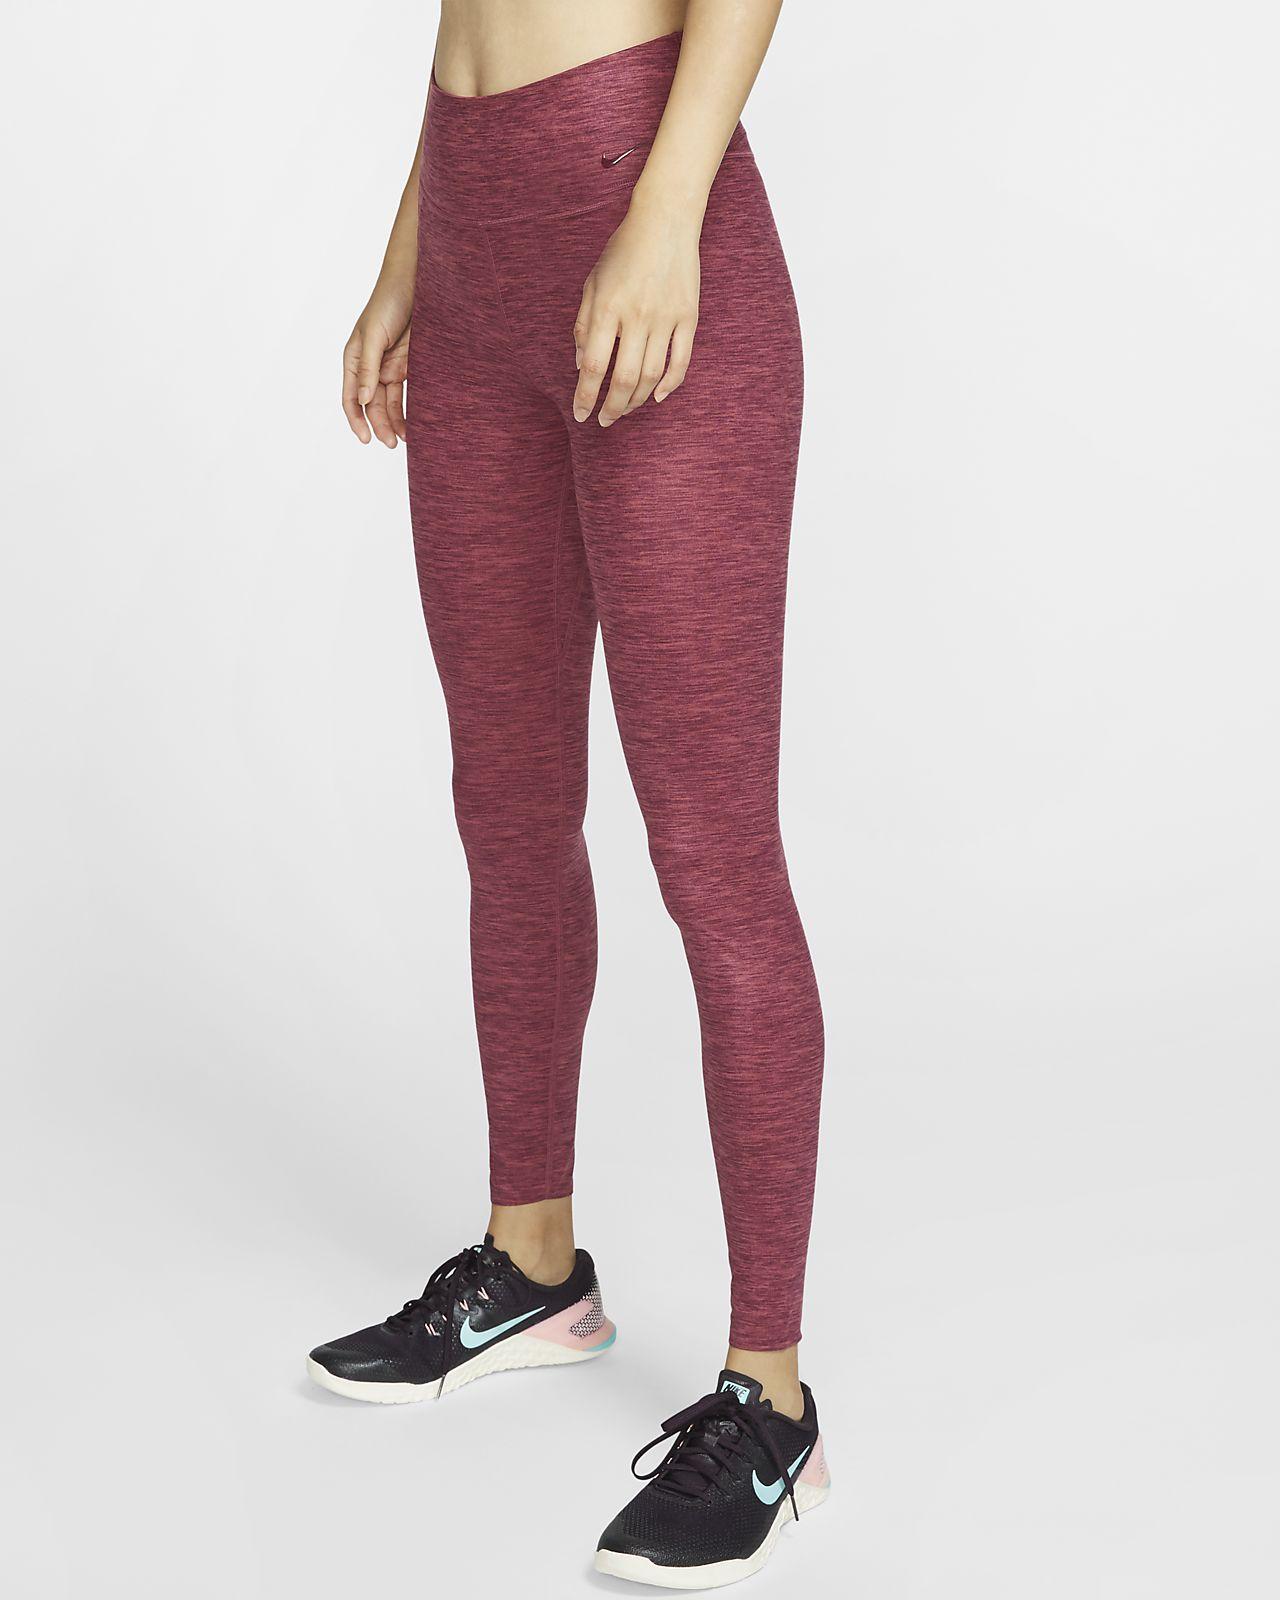 Женские тайтсы из меланжевой ткани Nike One Luxe